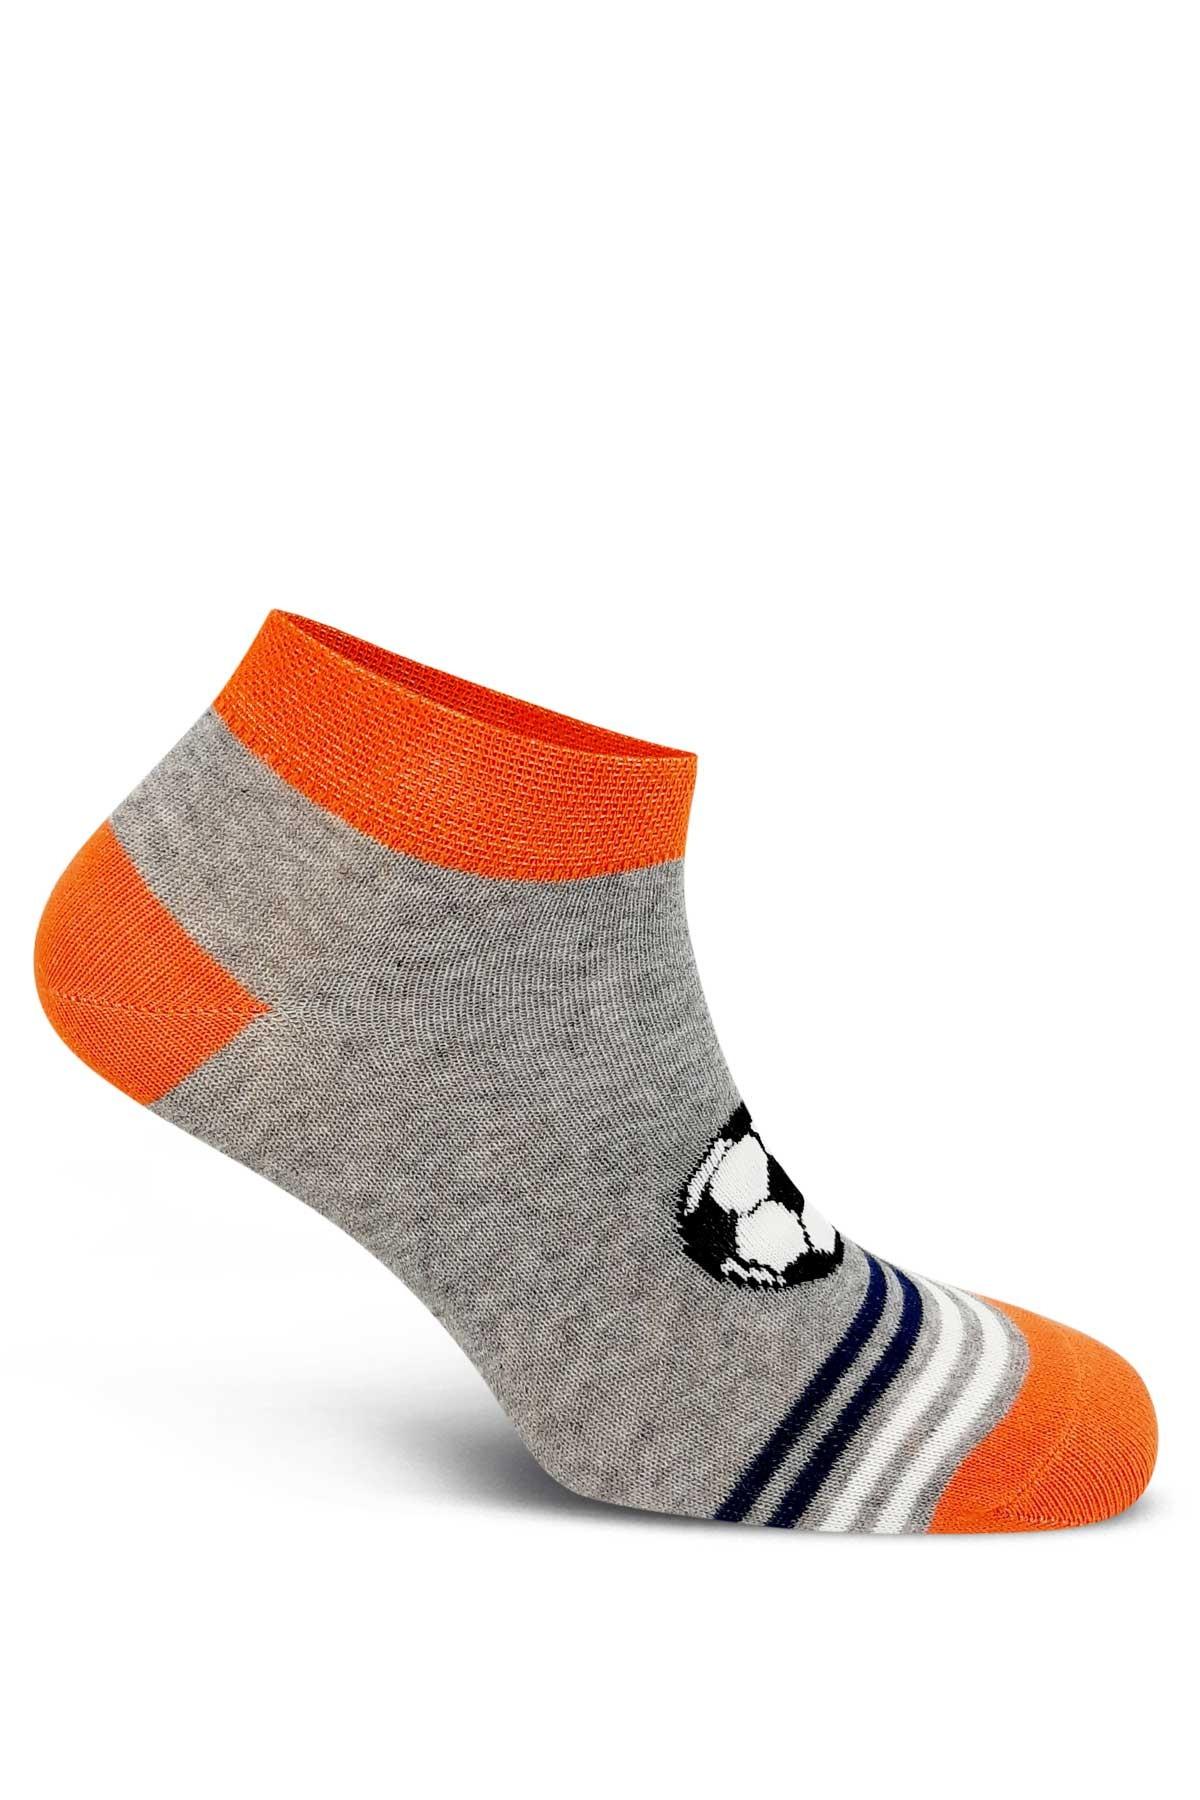 First Erkek Çocuk Patik Çorap Futbol Topu 3 lü - Asorti - 9 - Thumbnail